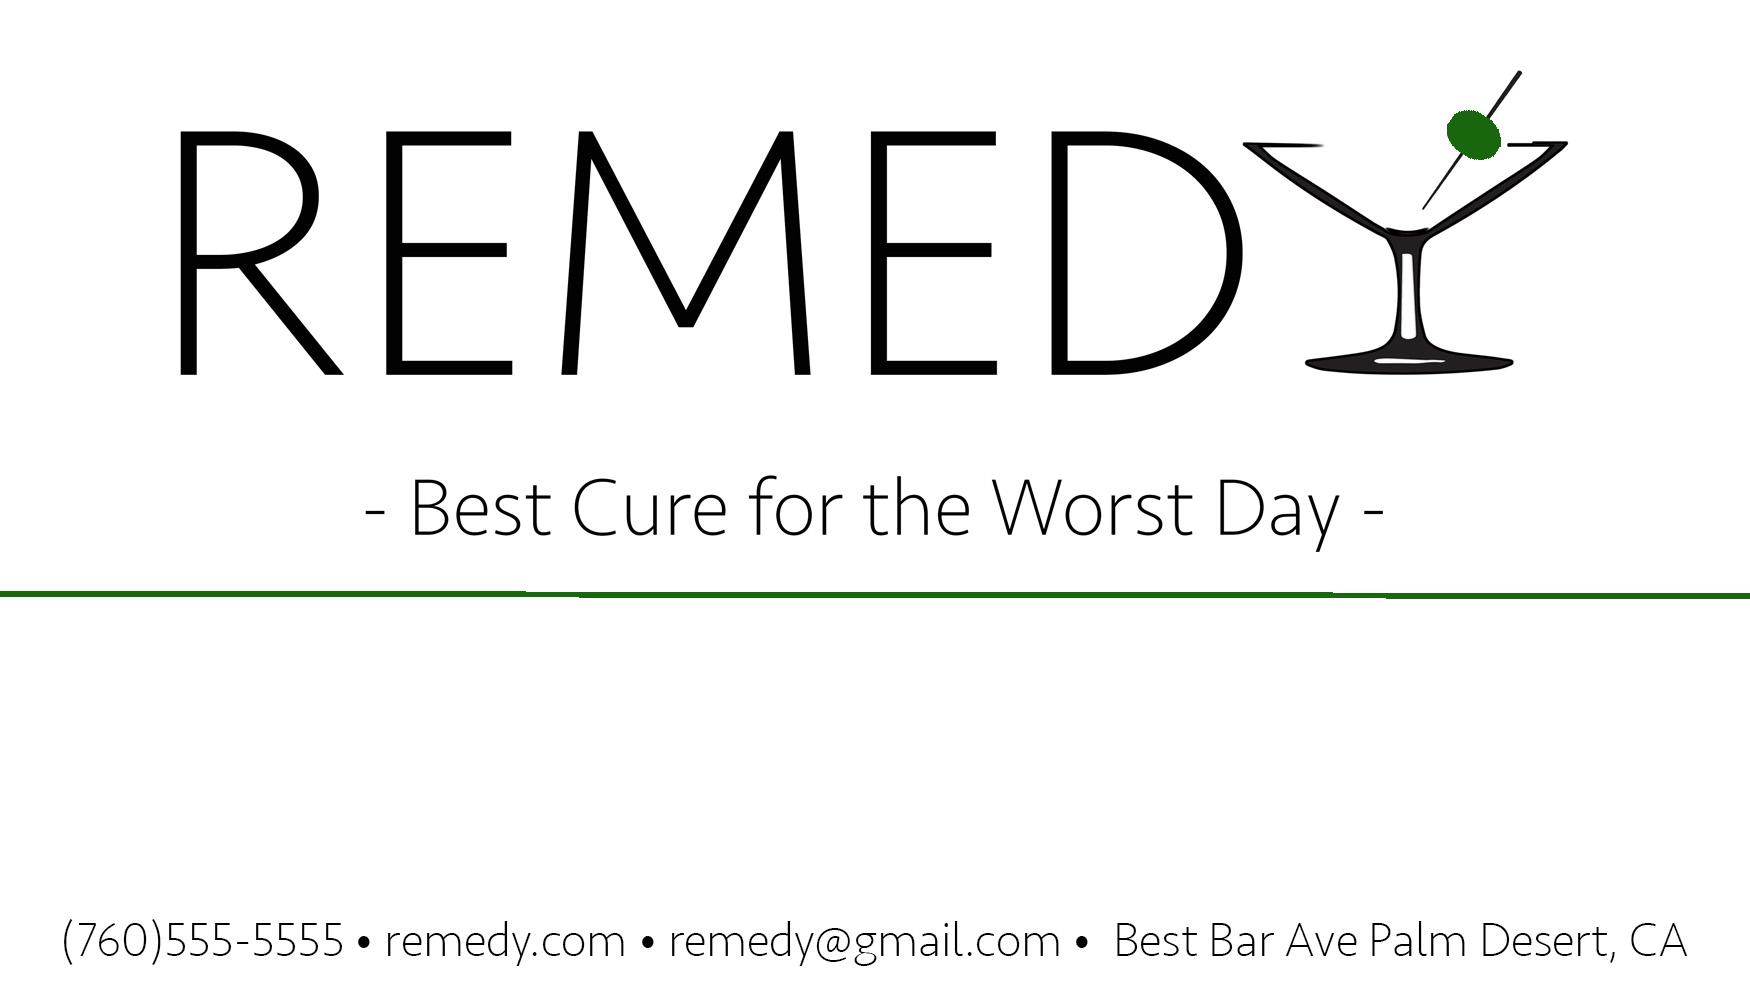 Remedybusinesscard